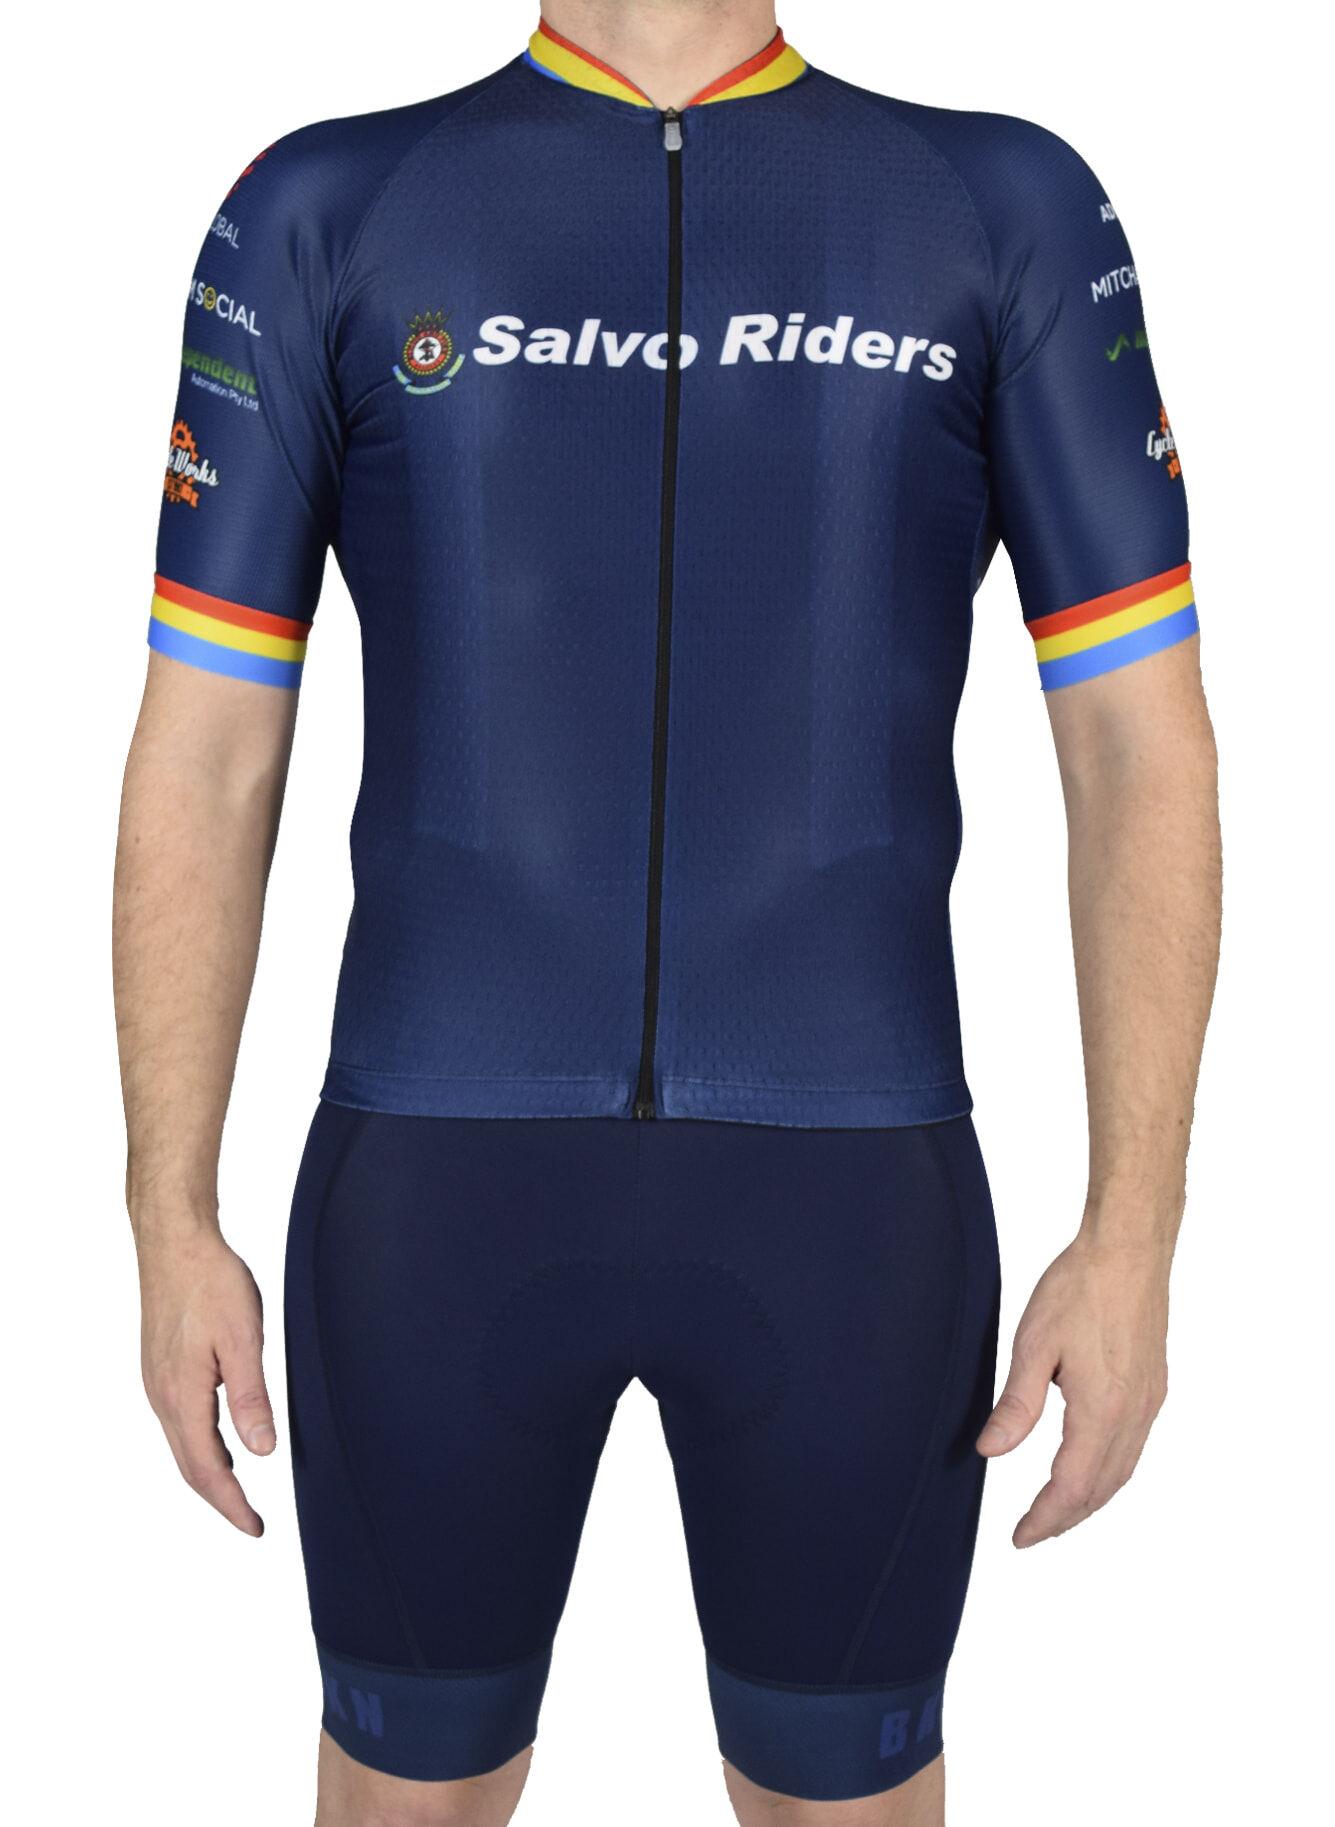 Salvo Riders Pro Jersey